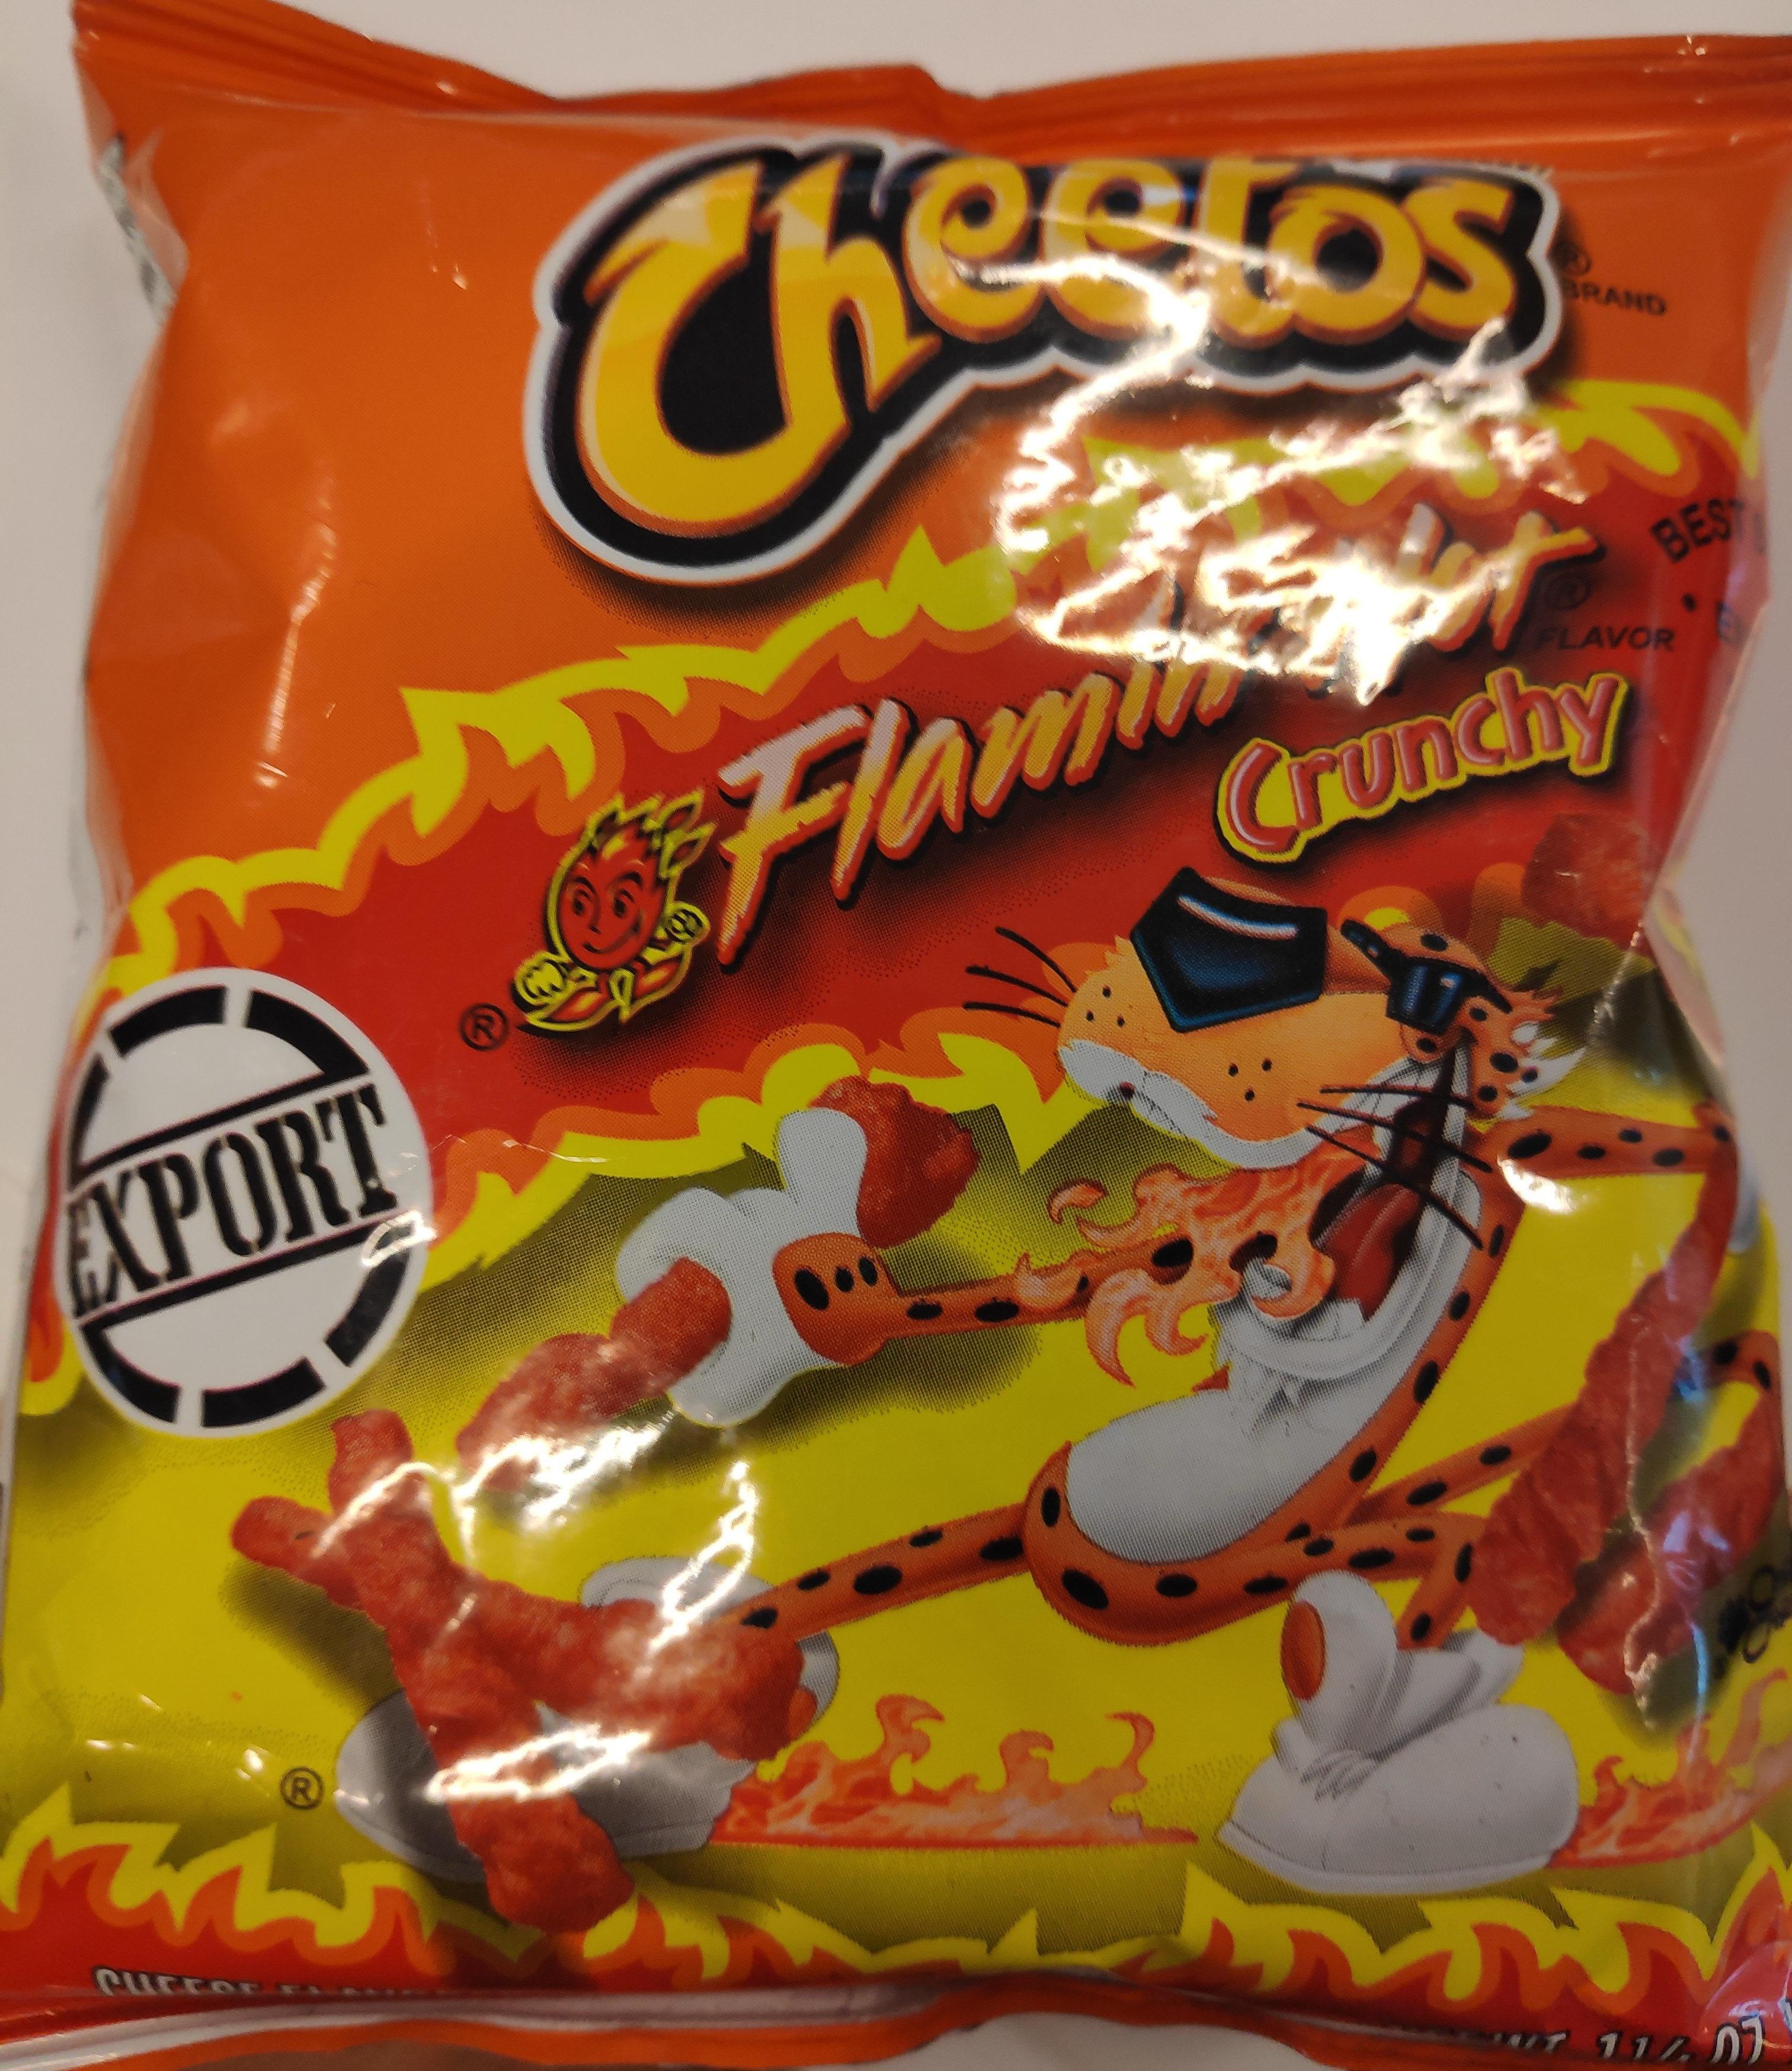 Cheetos Cheese Flavored Snacks Crunchy, Flamin' Hot - Produit